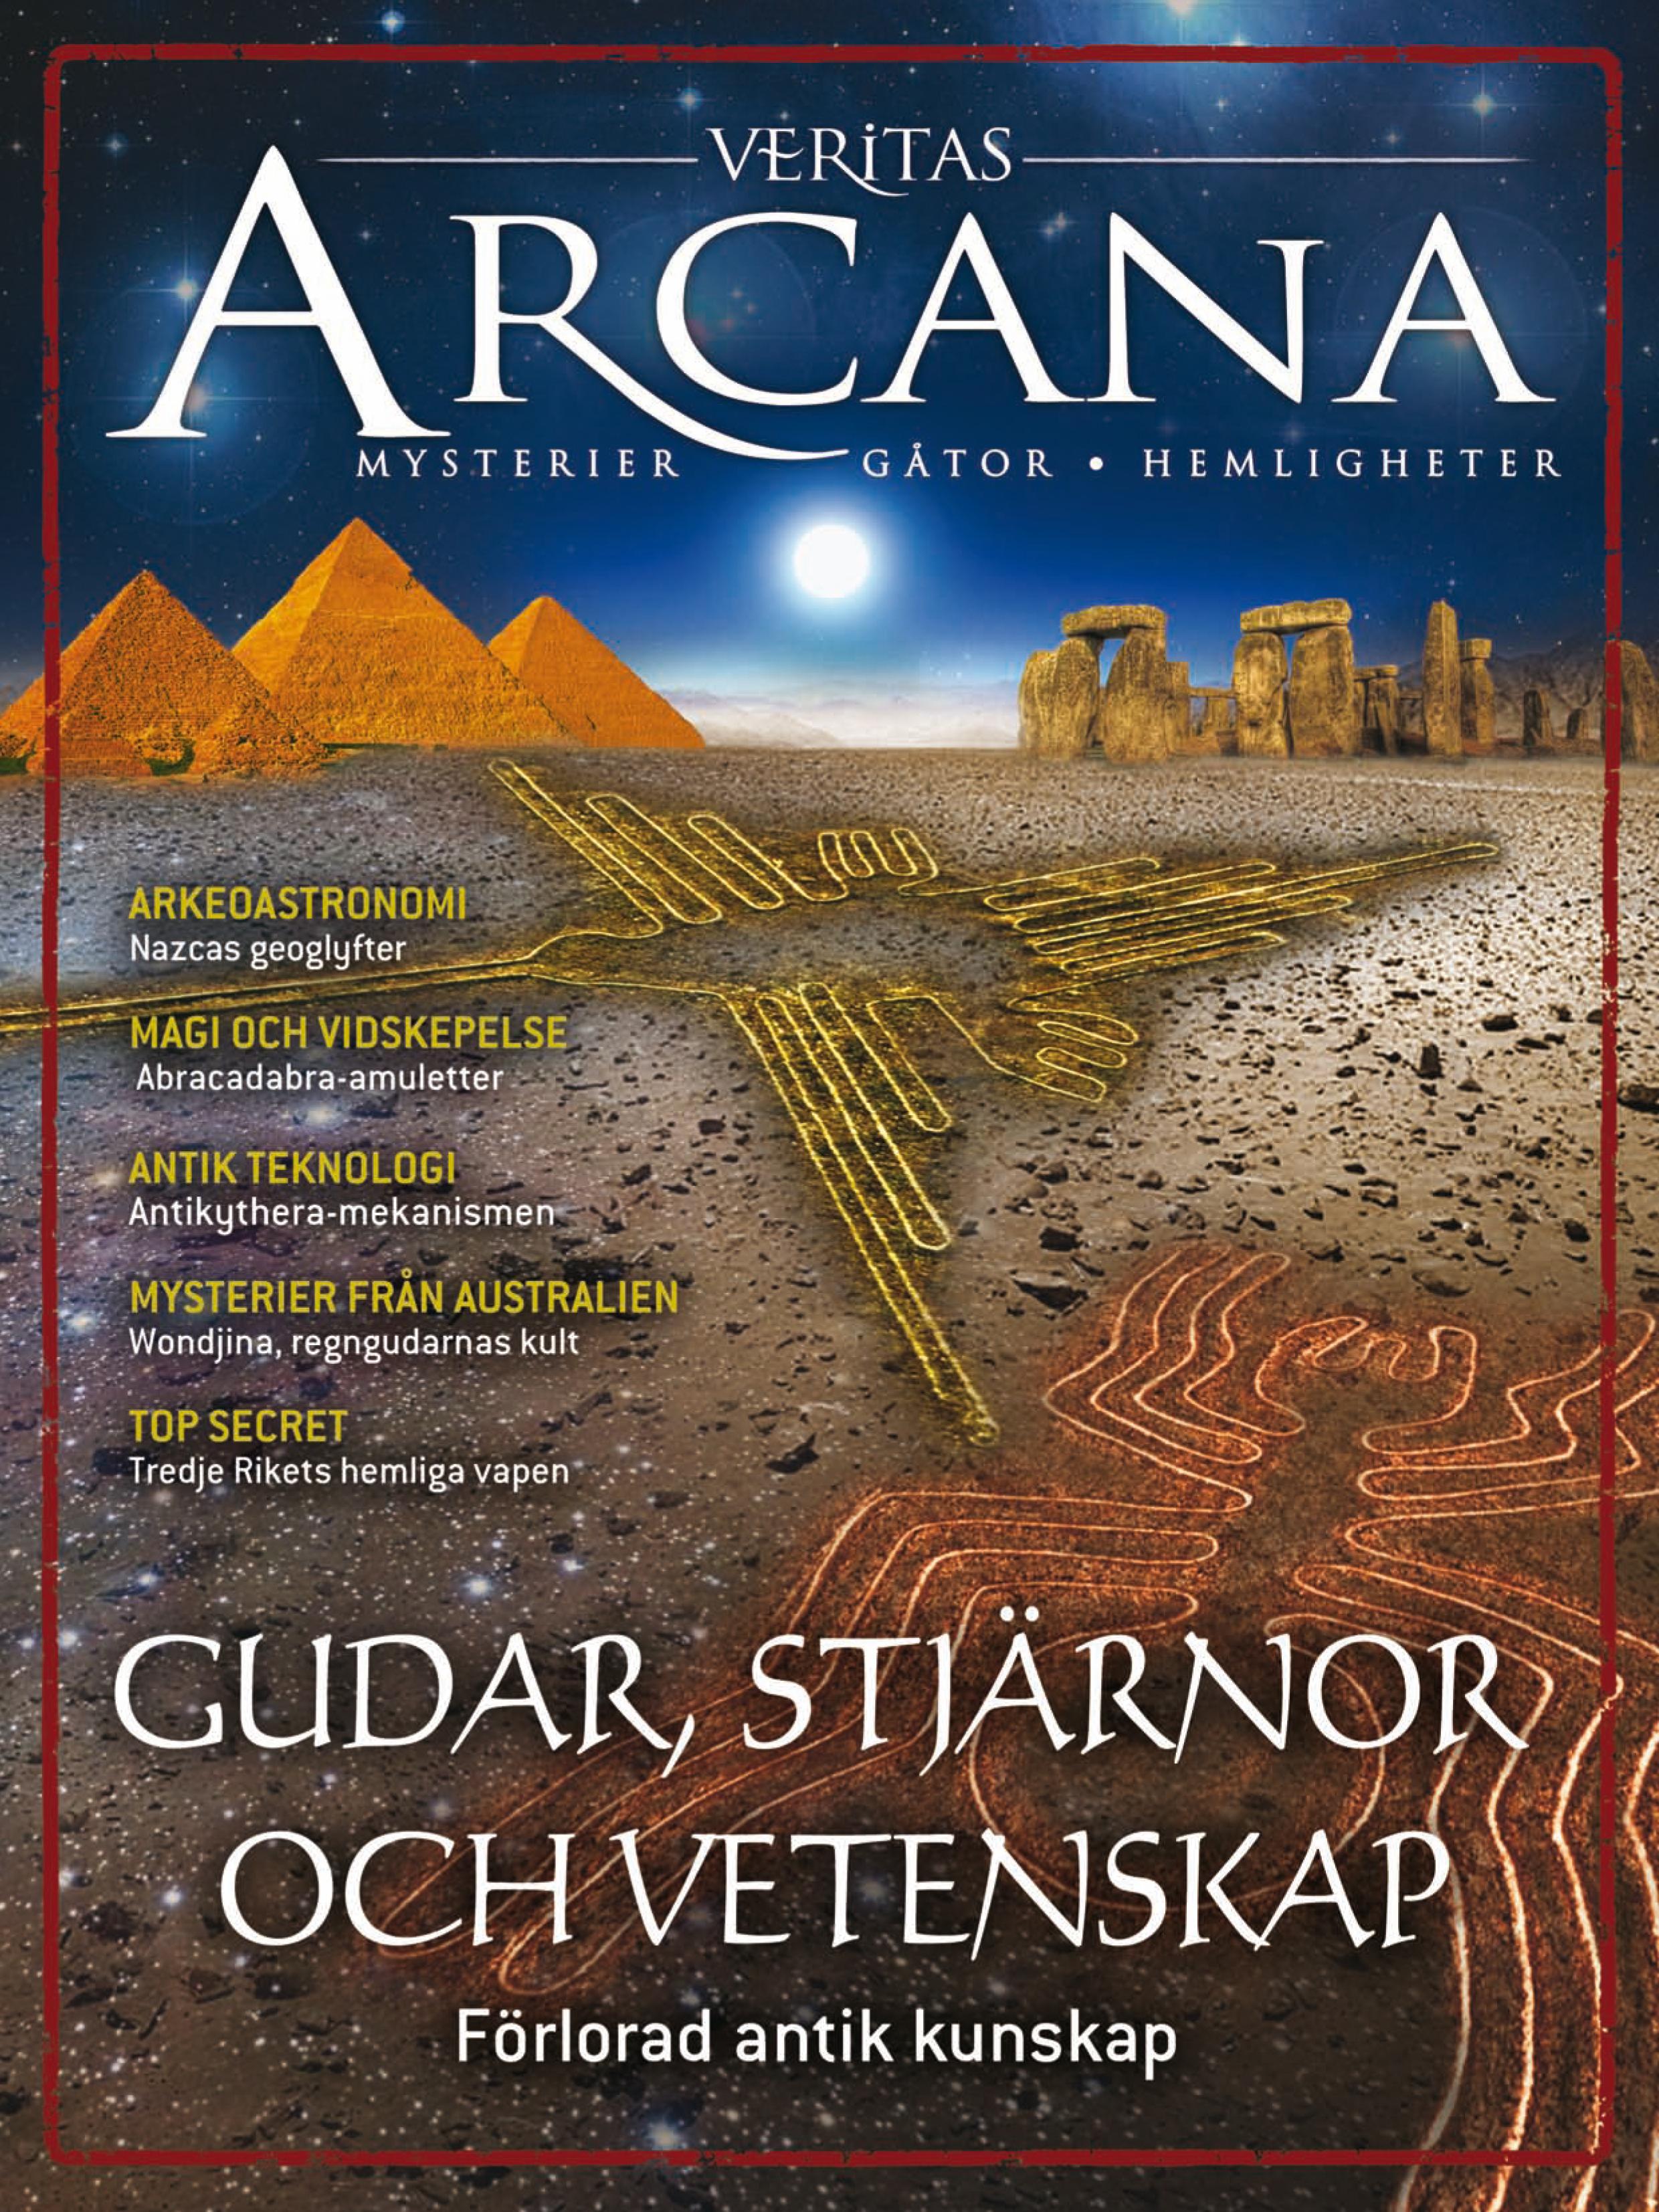 Veritas Arcana 1_2013.jpg